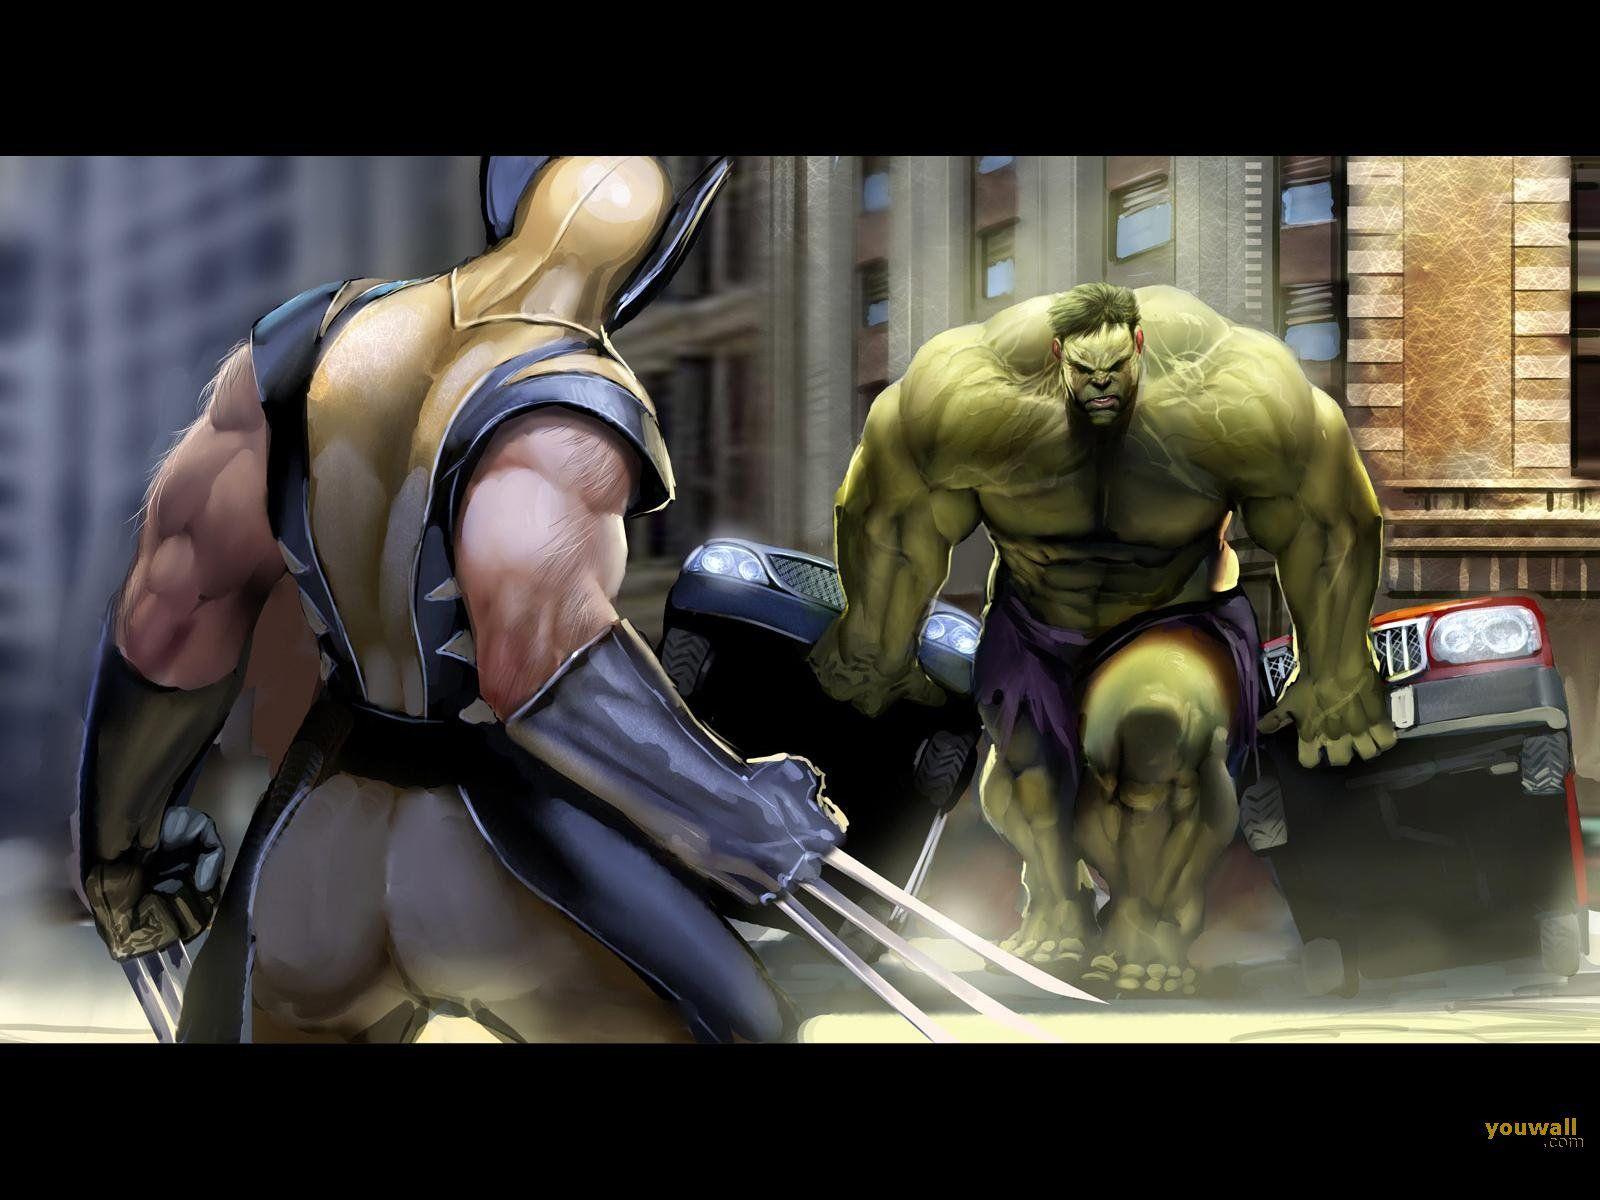 Hulk 2 Wallpapers Hulk Cartoon Nice Wallpaper Download 1600x1200